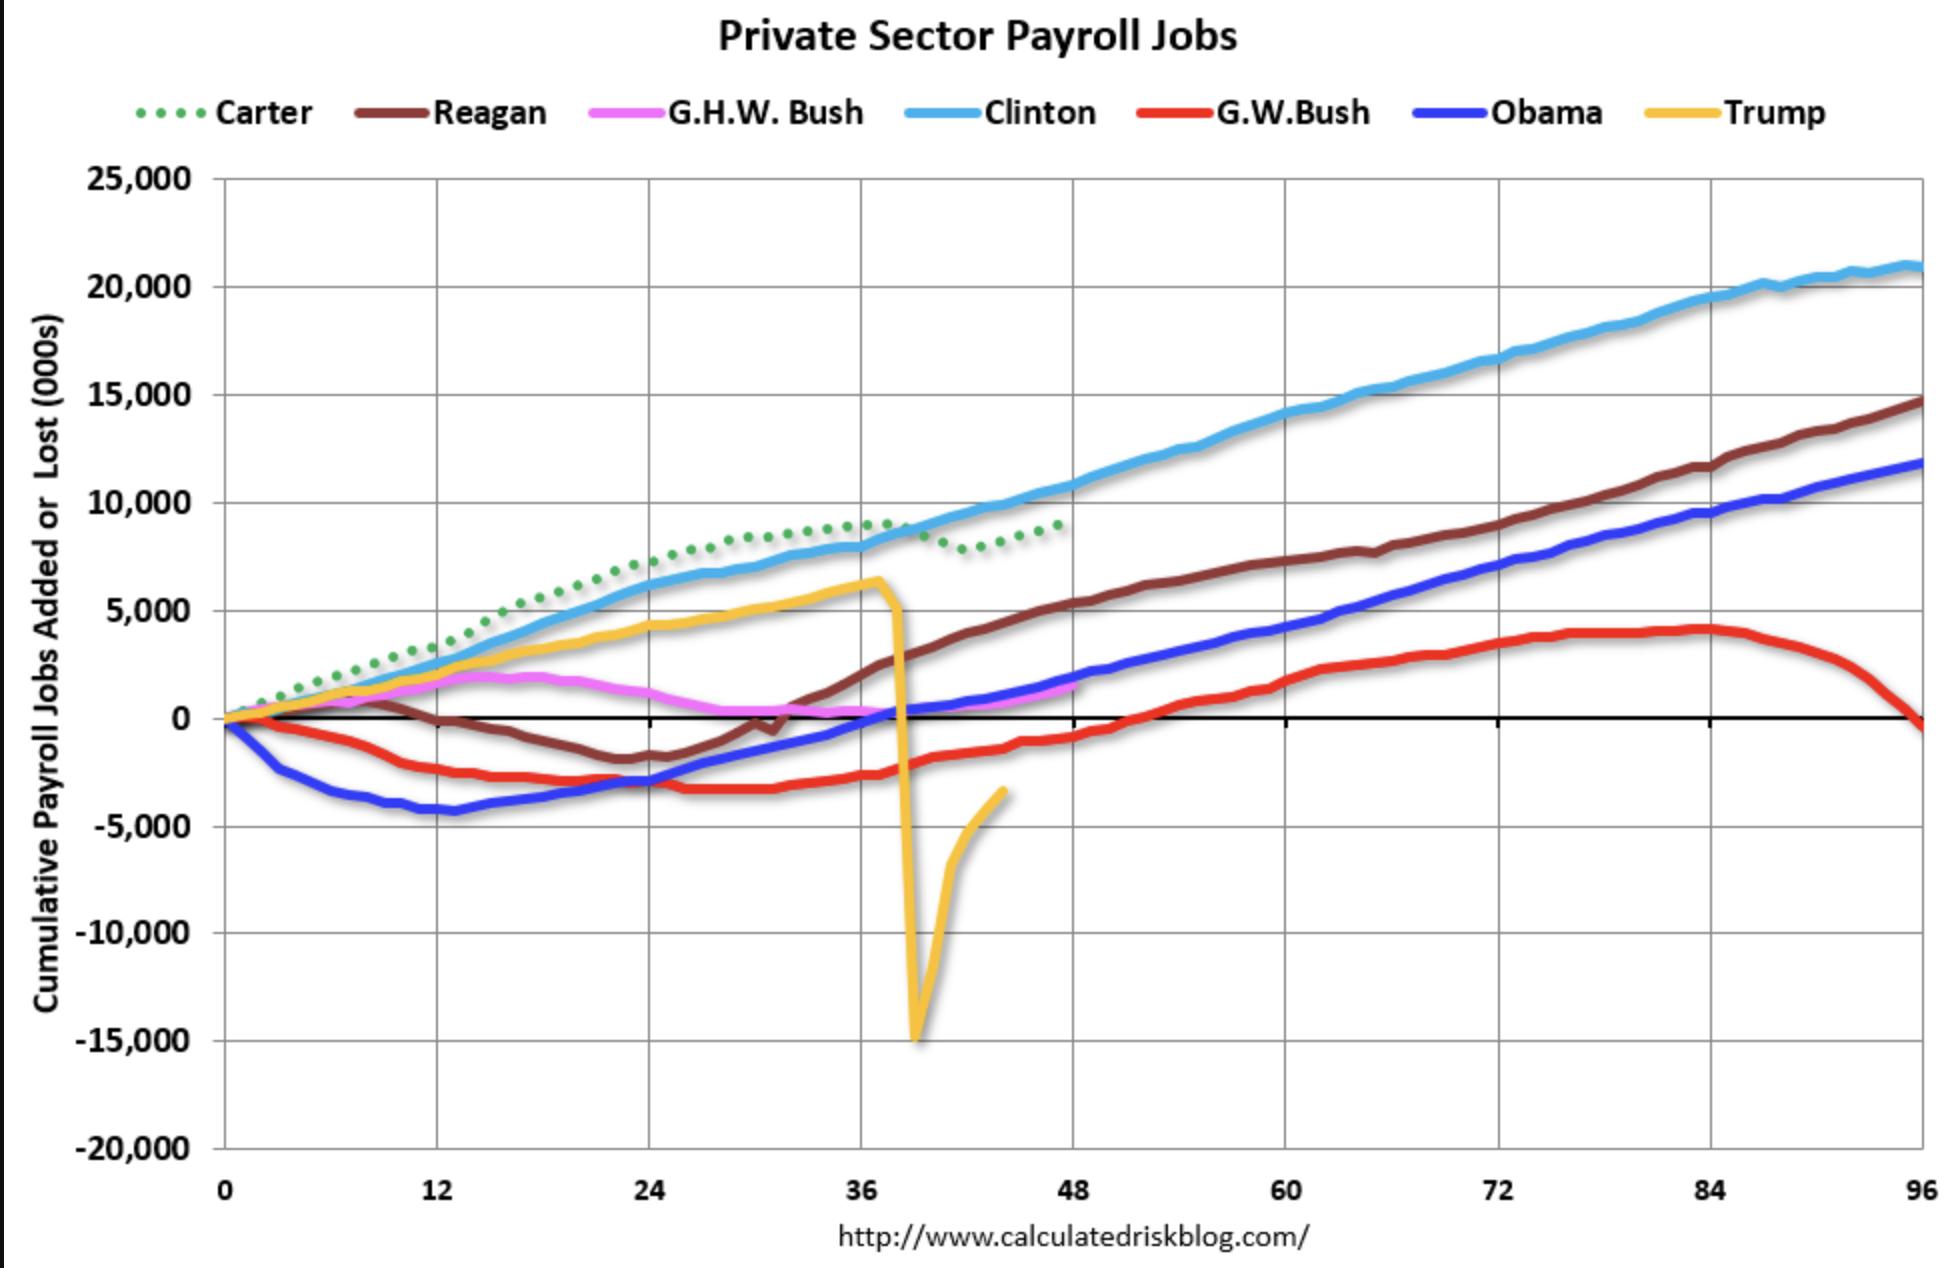 Job Creation Under U.S. Presidents